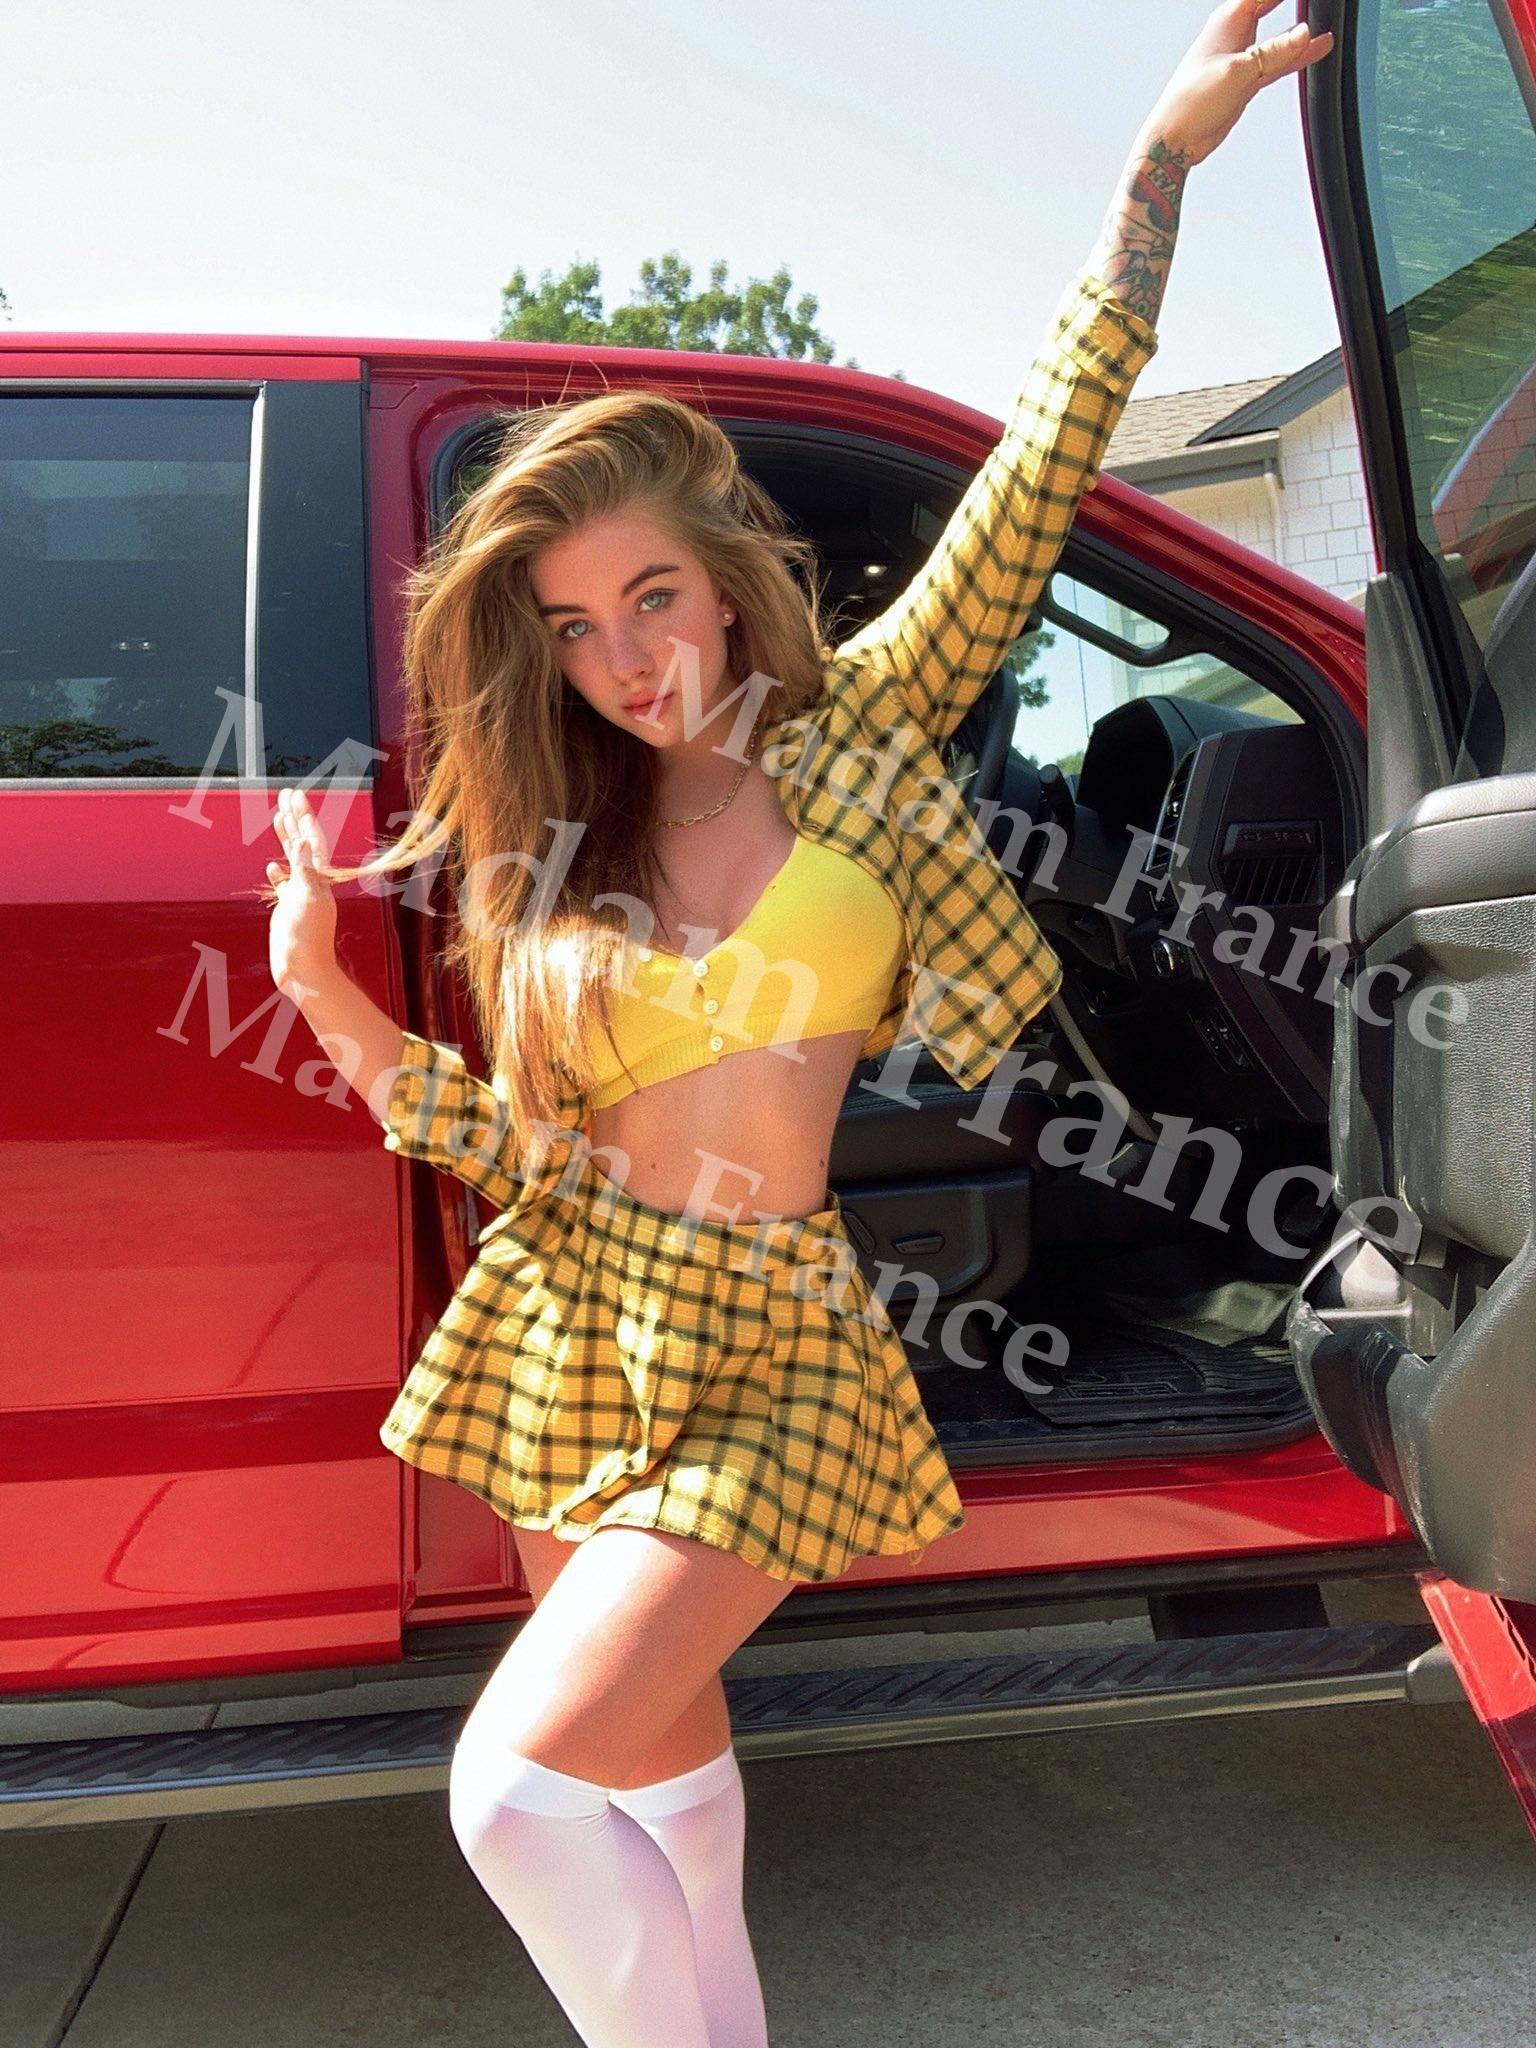 Leslie arah model on Madam France escort service